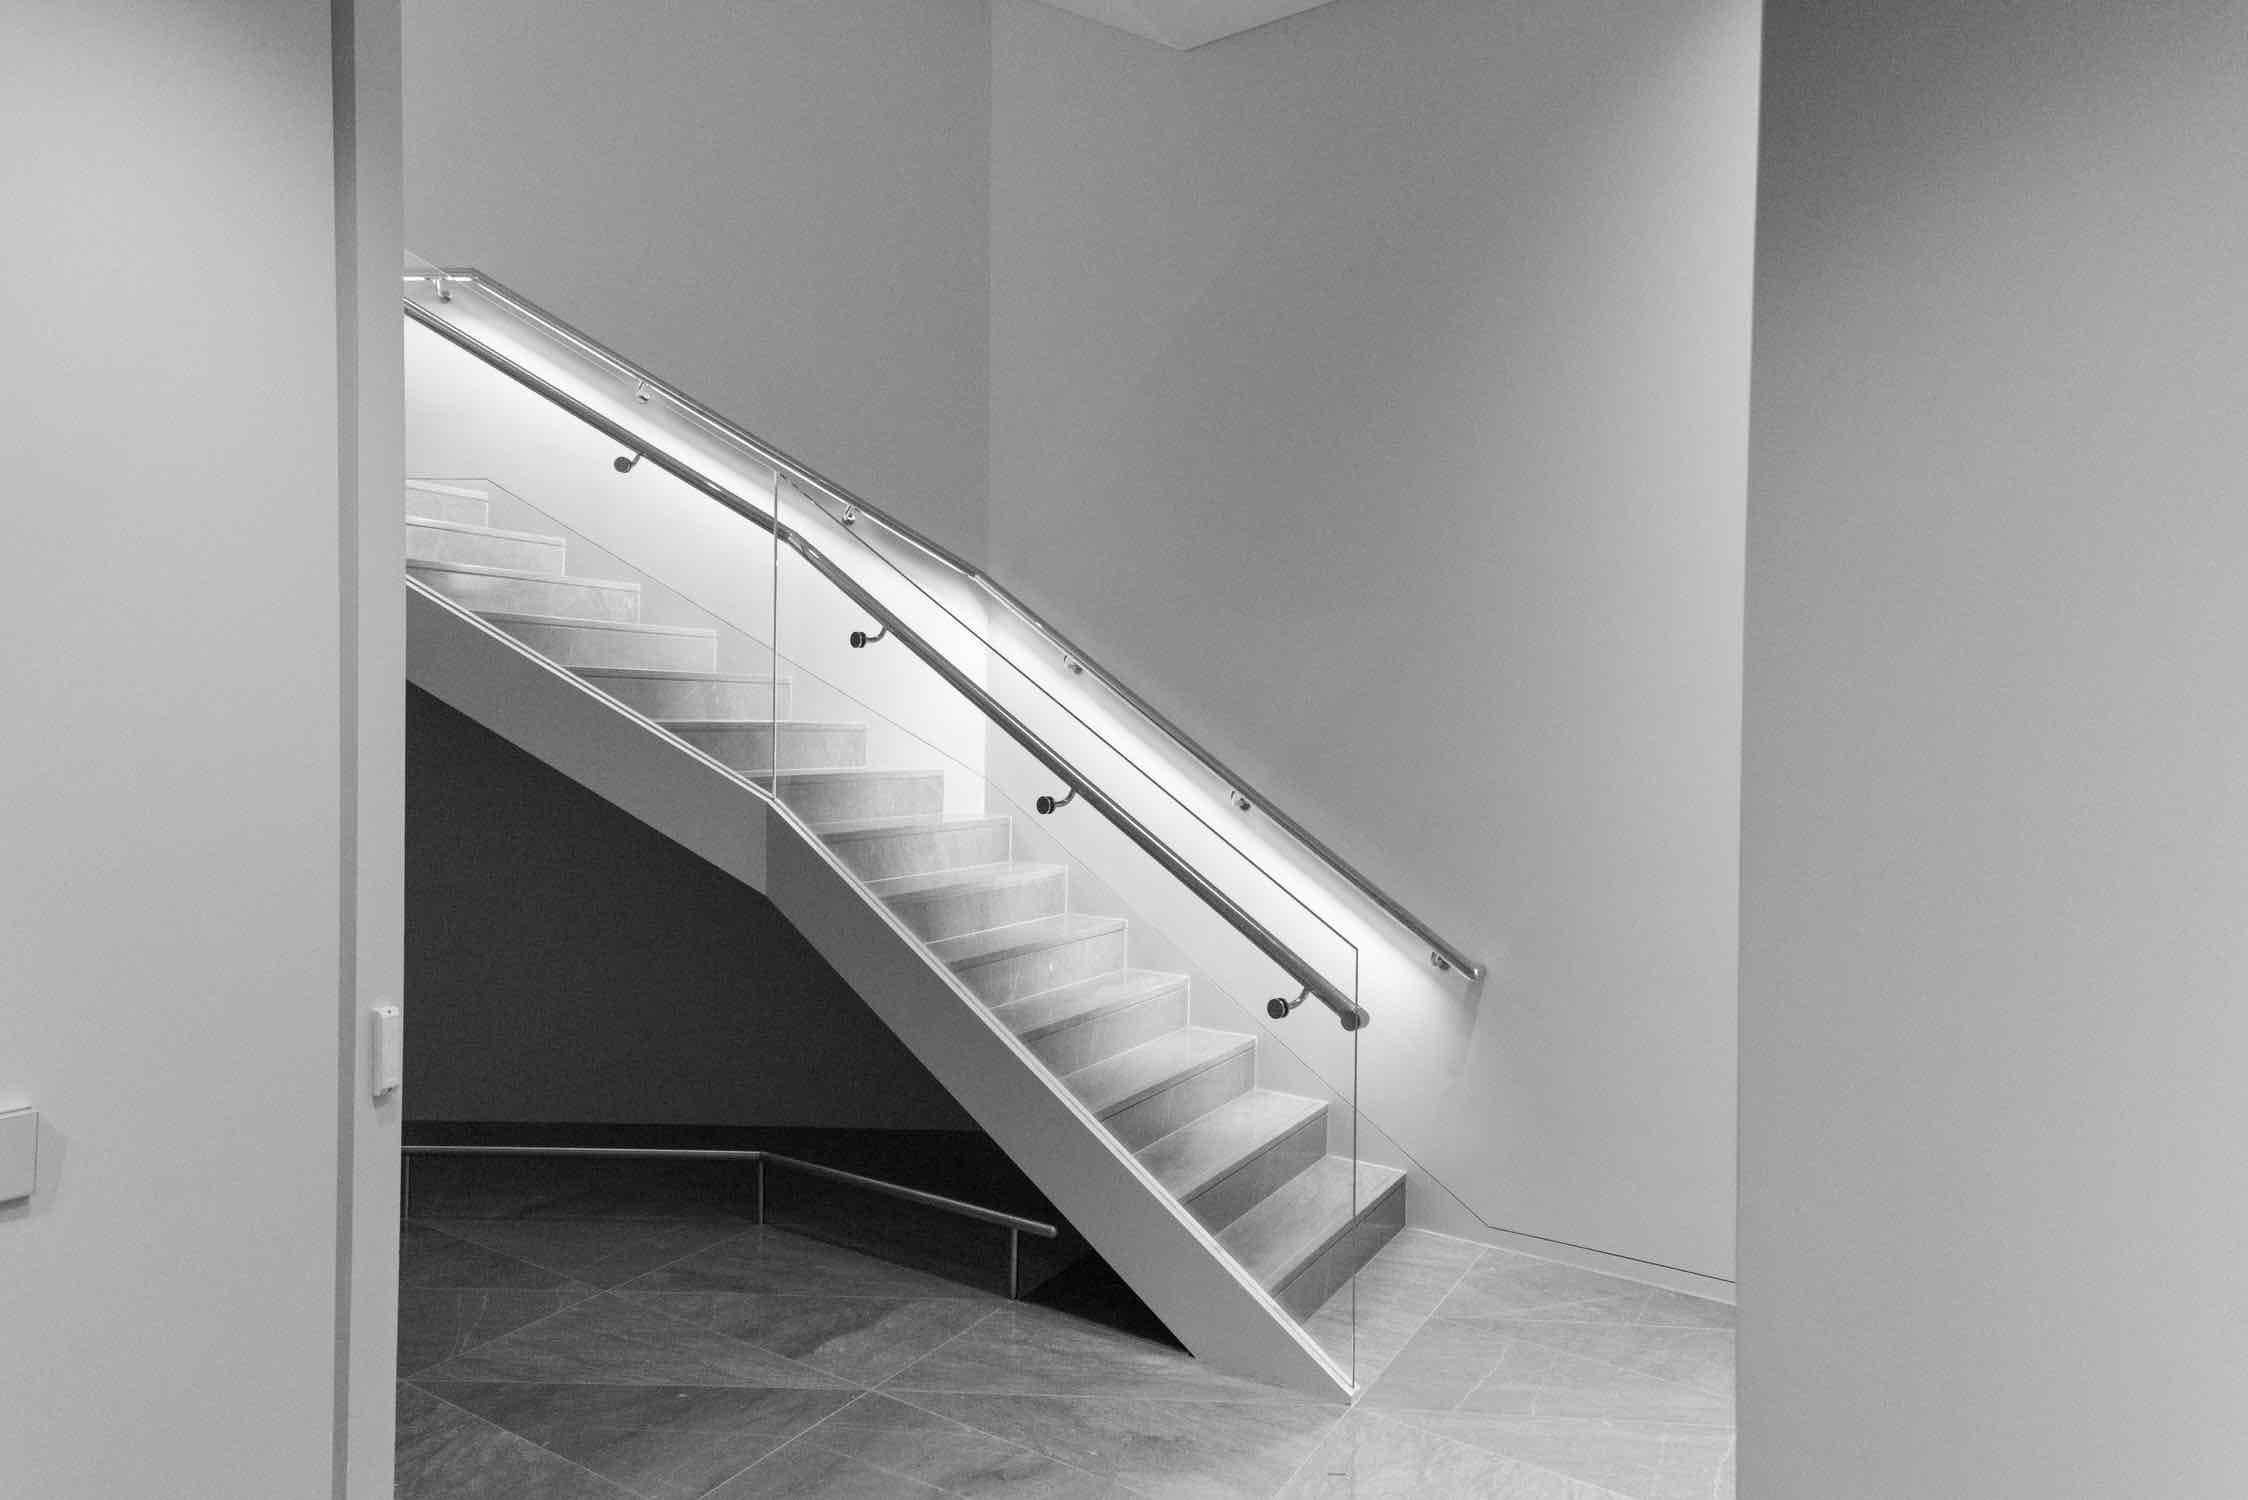 Handlaufbeleuchtung Treppenhaus